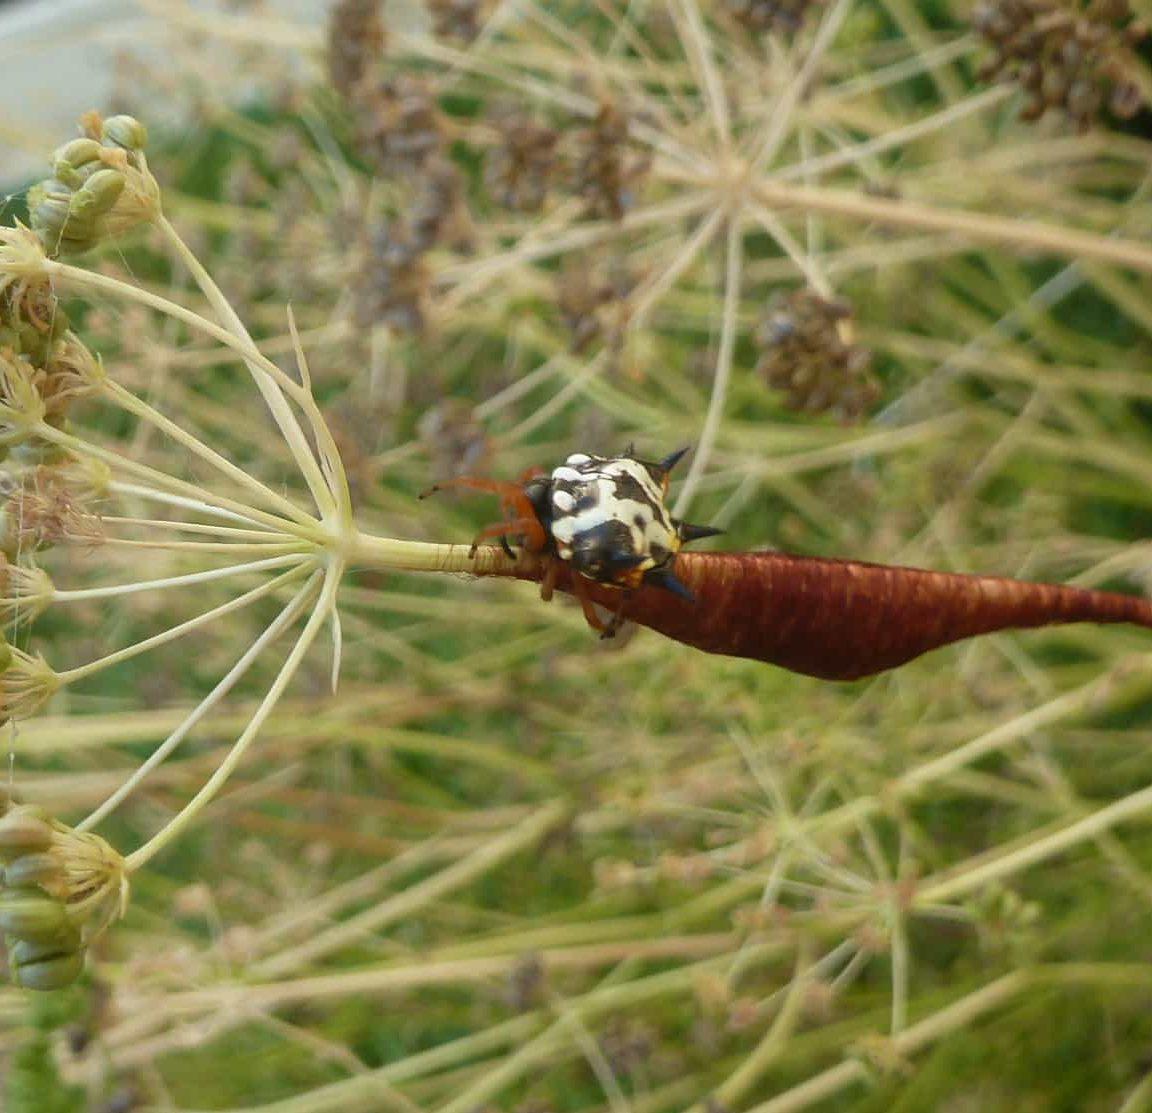 Picture of Austracantha minax (Jewel Spider) - Female - Dorsal,Egg sacs